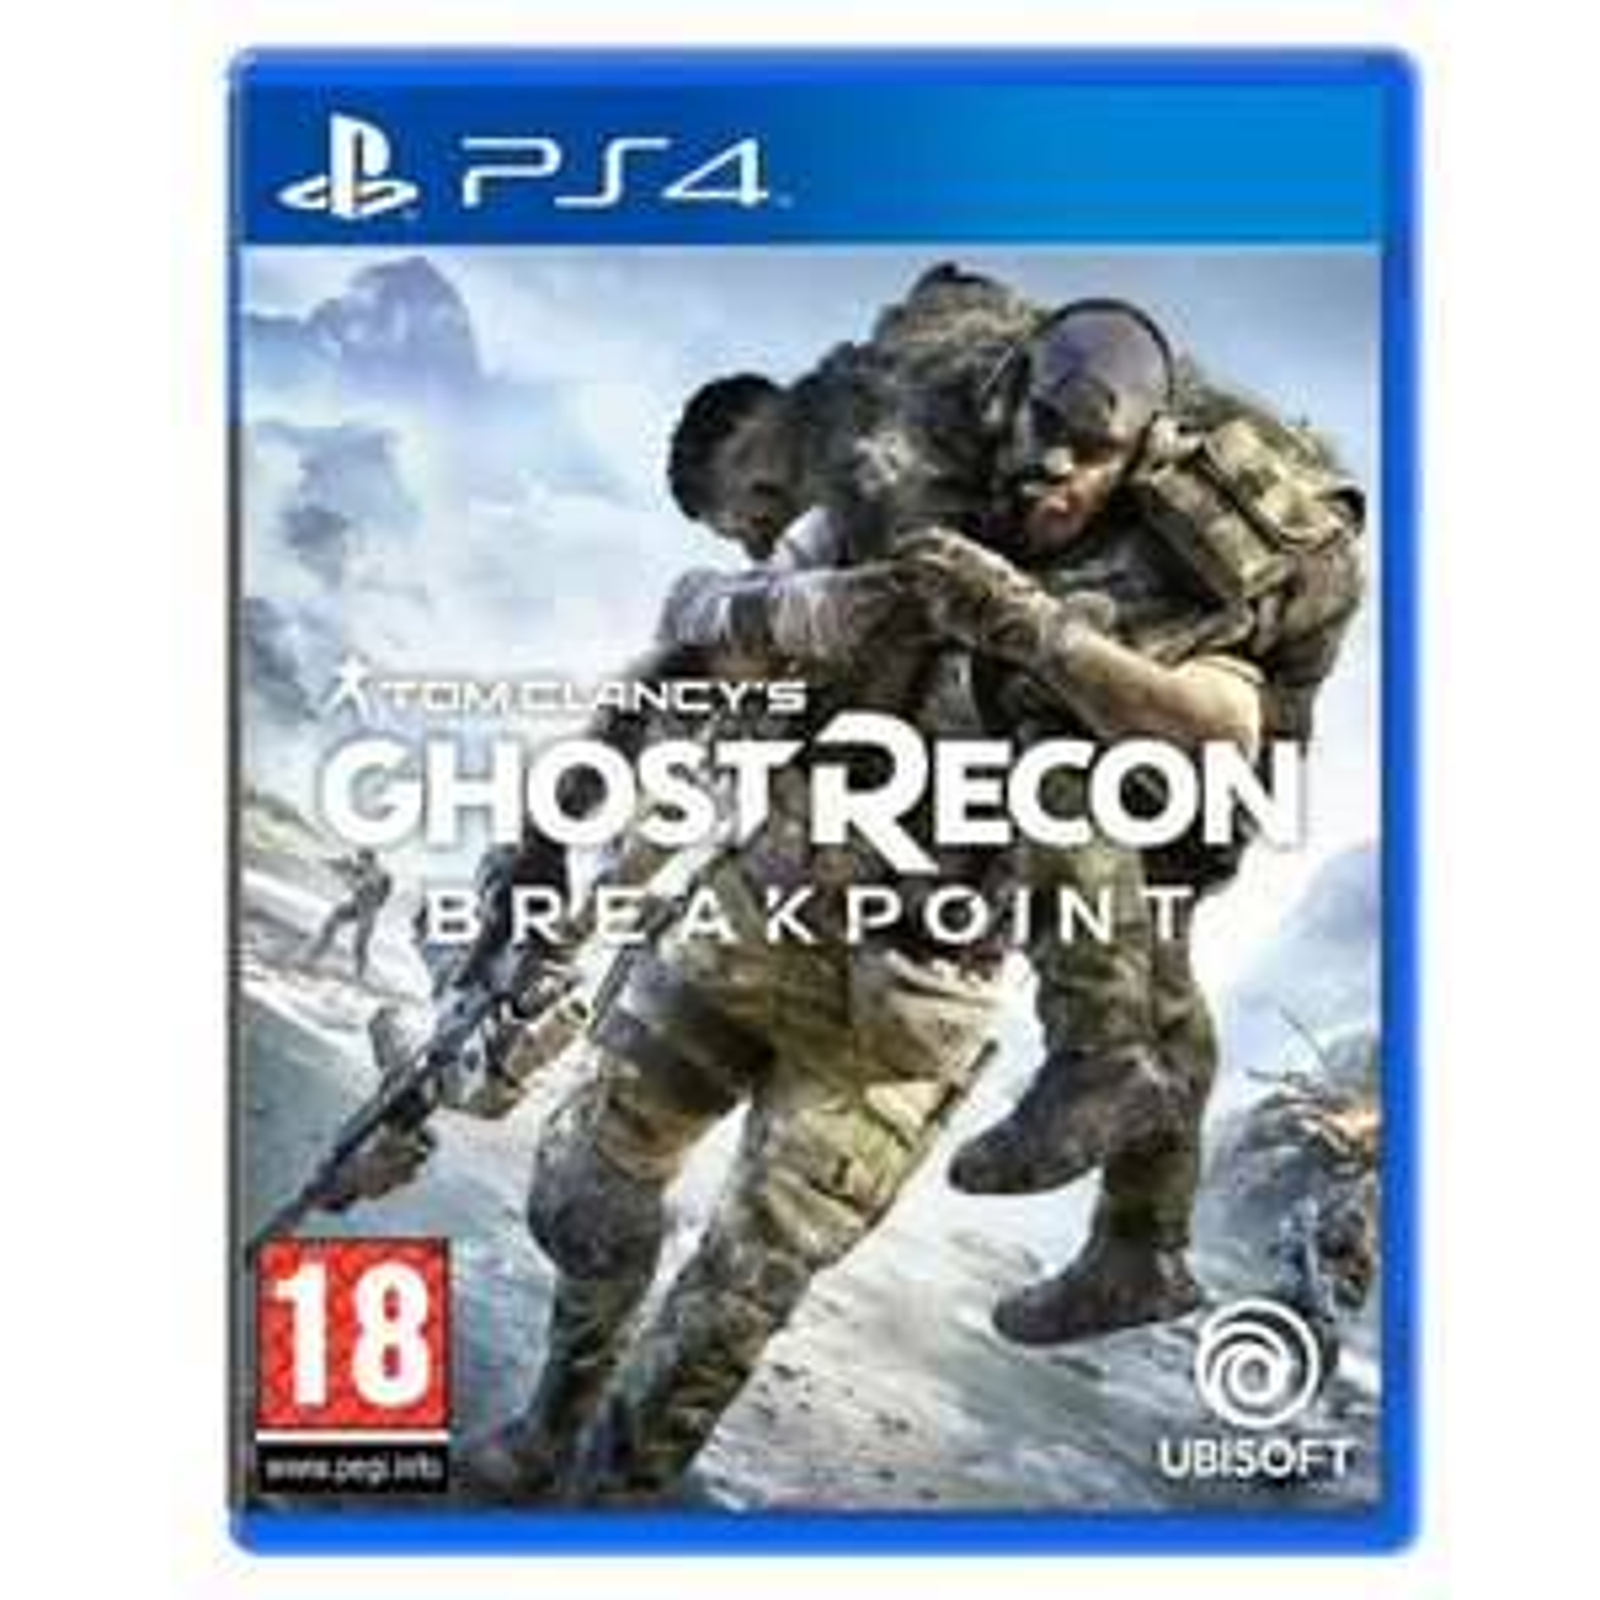 Tom Clancy's Ghost Recon Breakpoint sur PS4 (+0.60€ en SuperPoints)